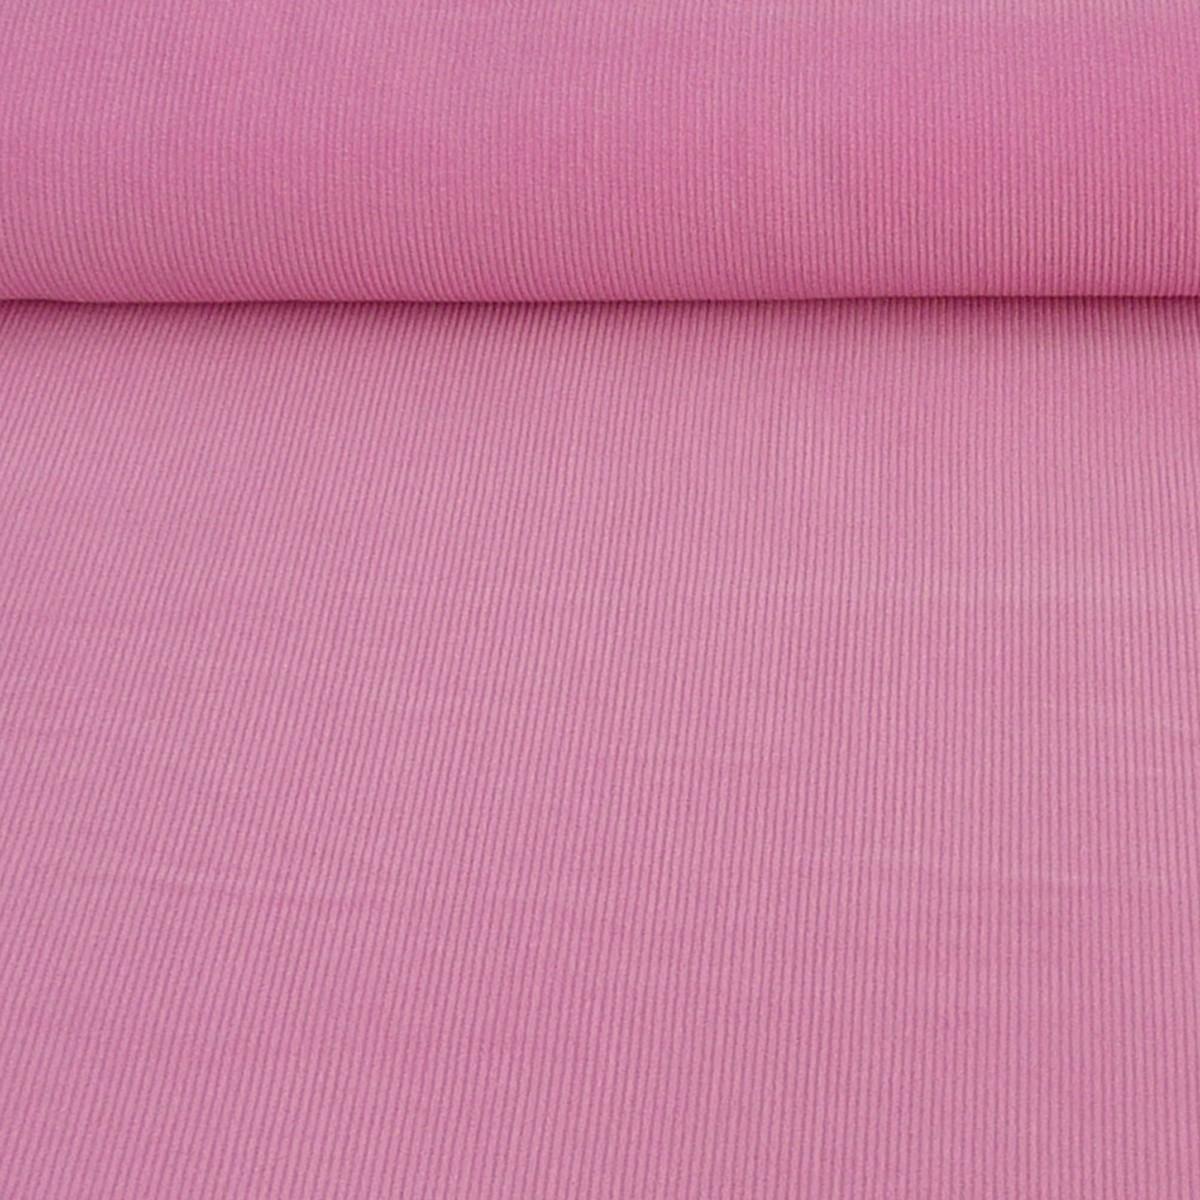 Bekleidungsstoff Cord einfarbig rosa